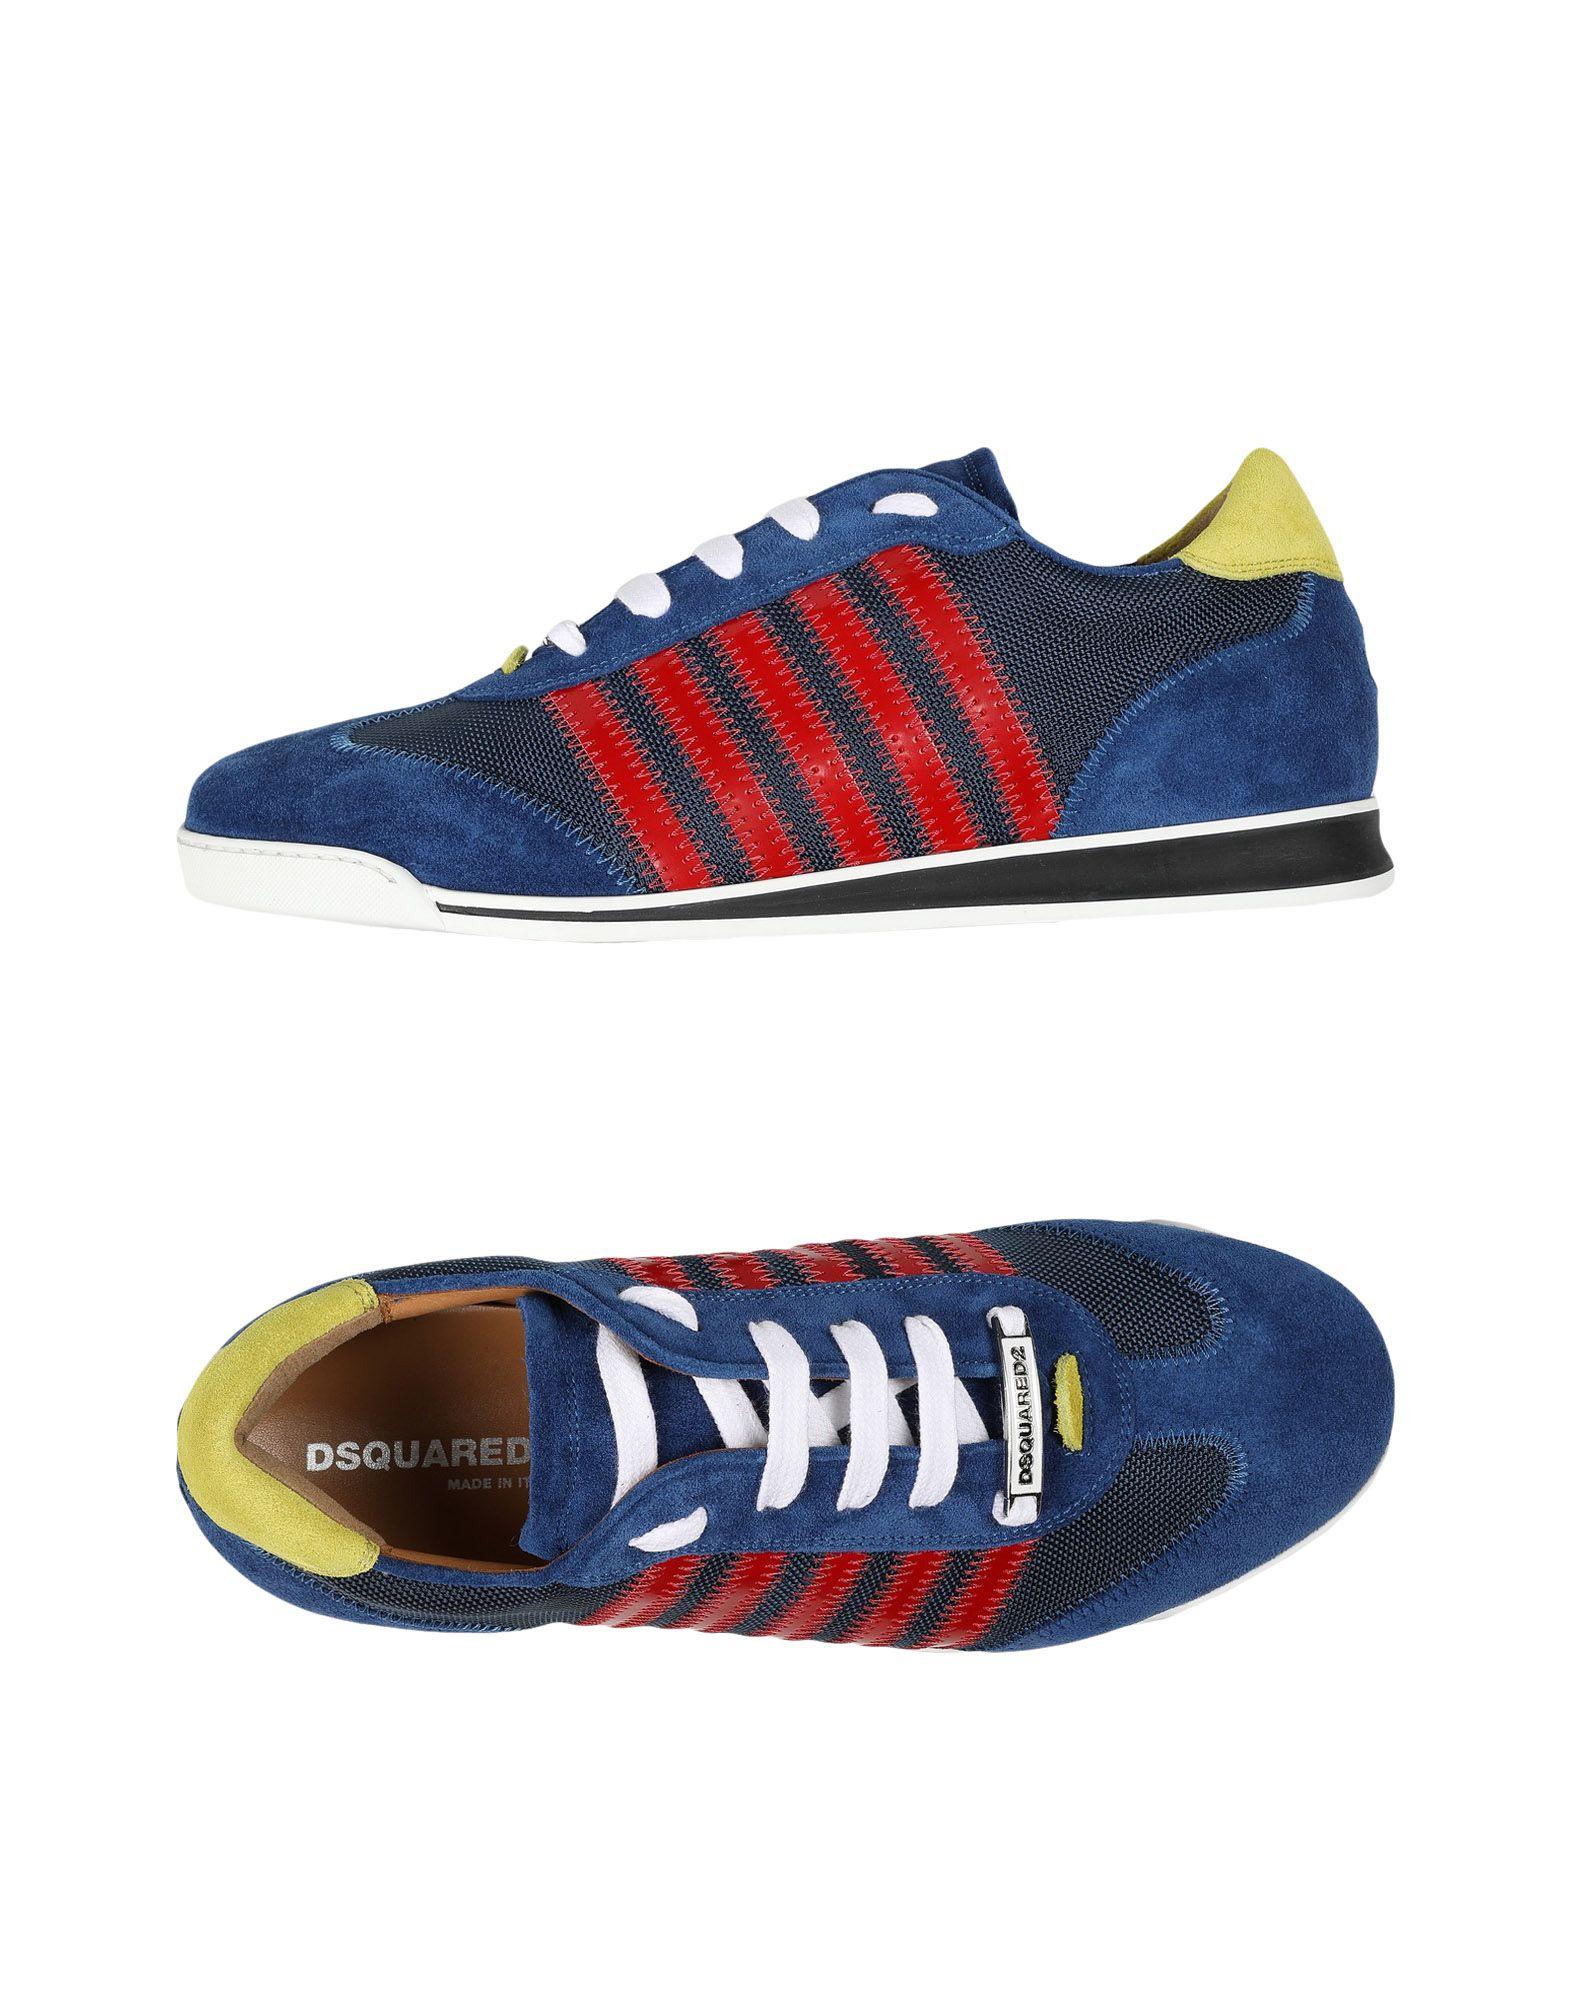 Dsquared2 Sneakers Herren  11409365CE Gute Qualität beliebte Schuhe